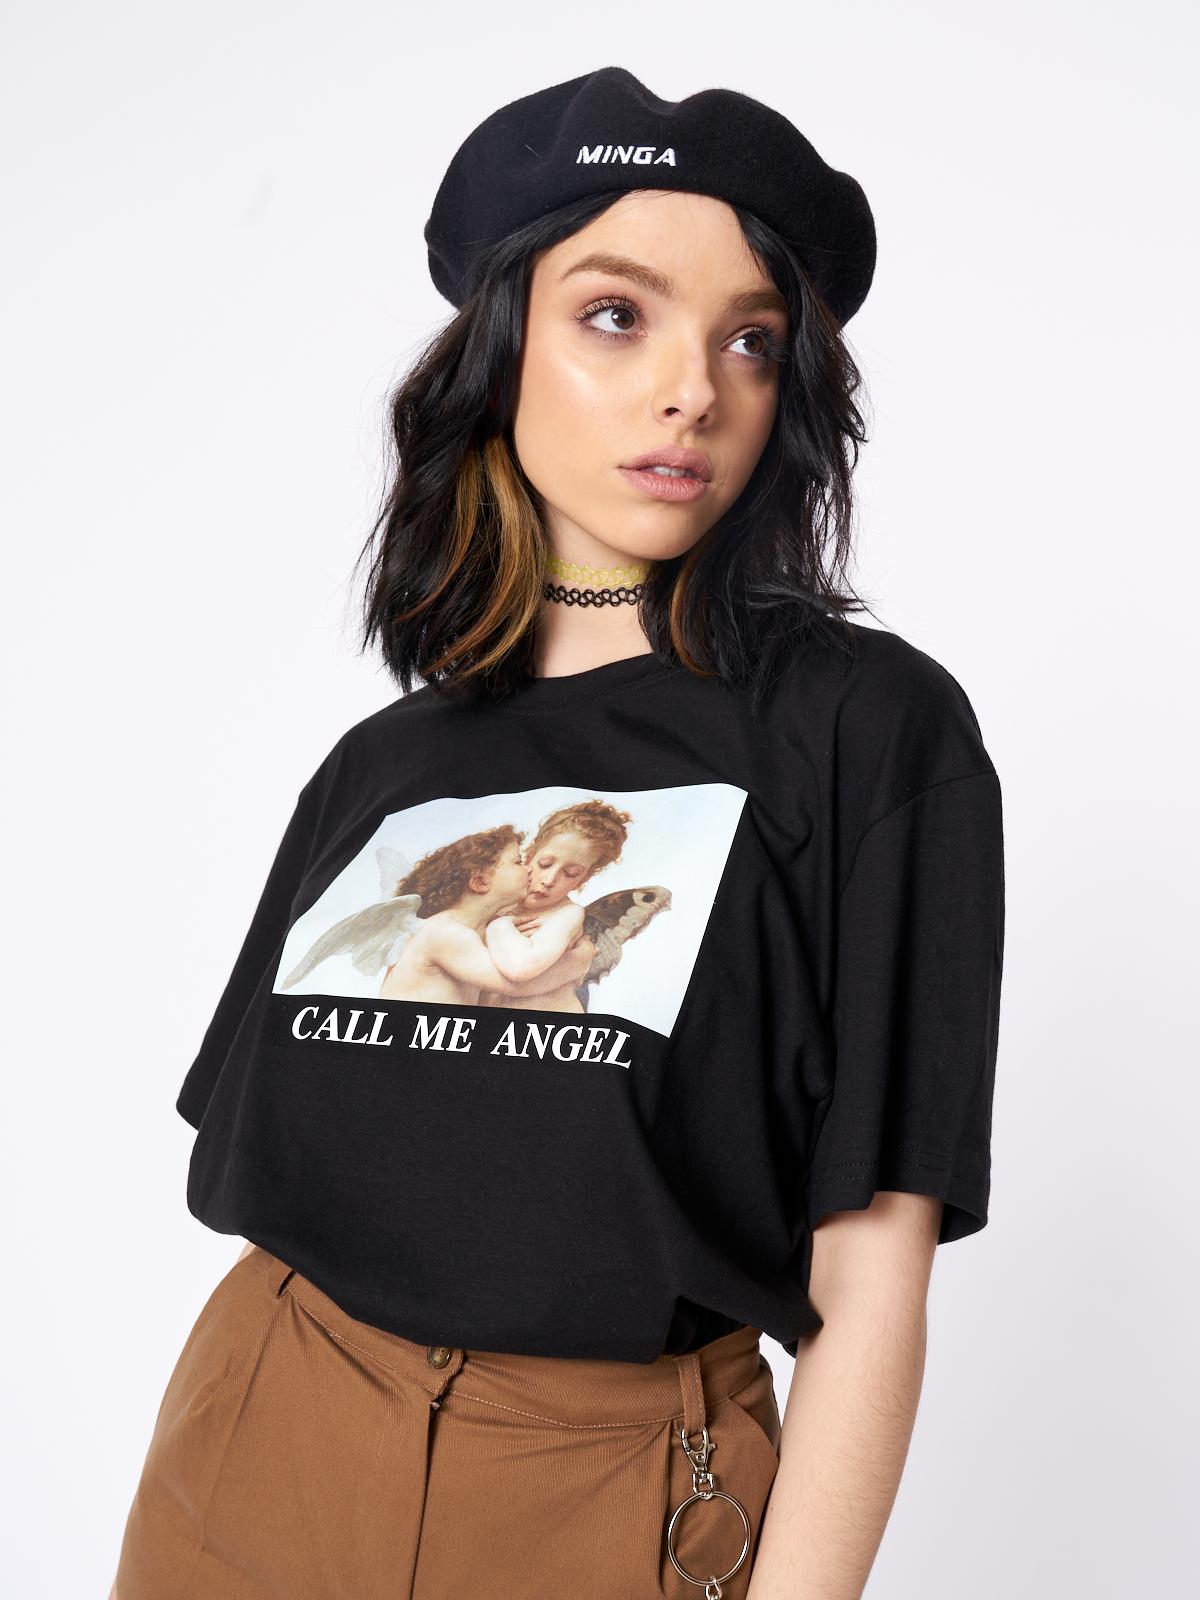 Call Me Angel T Shirt Oversized Tee Outfit T Shirts For Women Retro Fashion Women